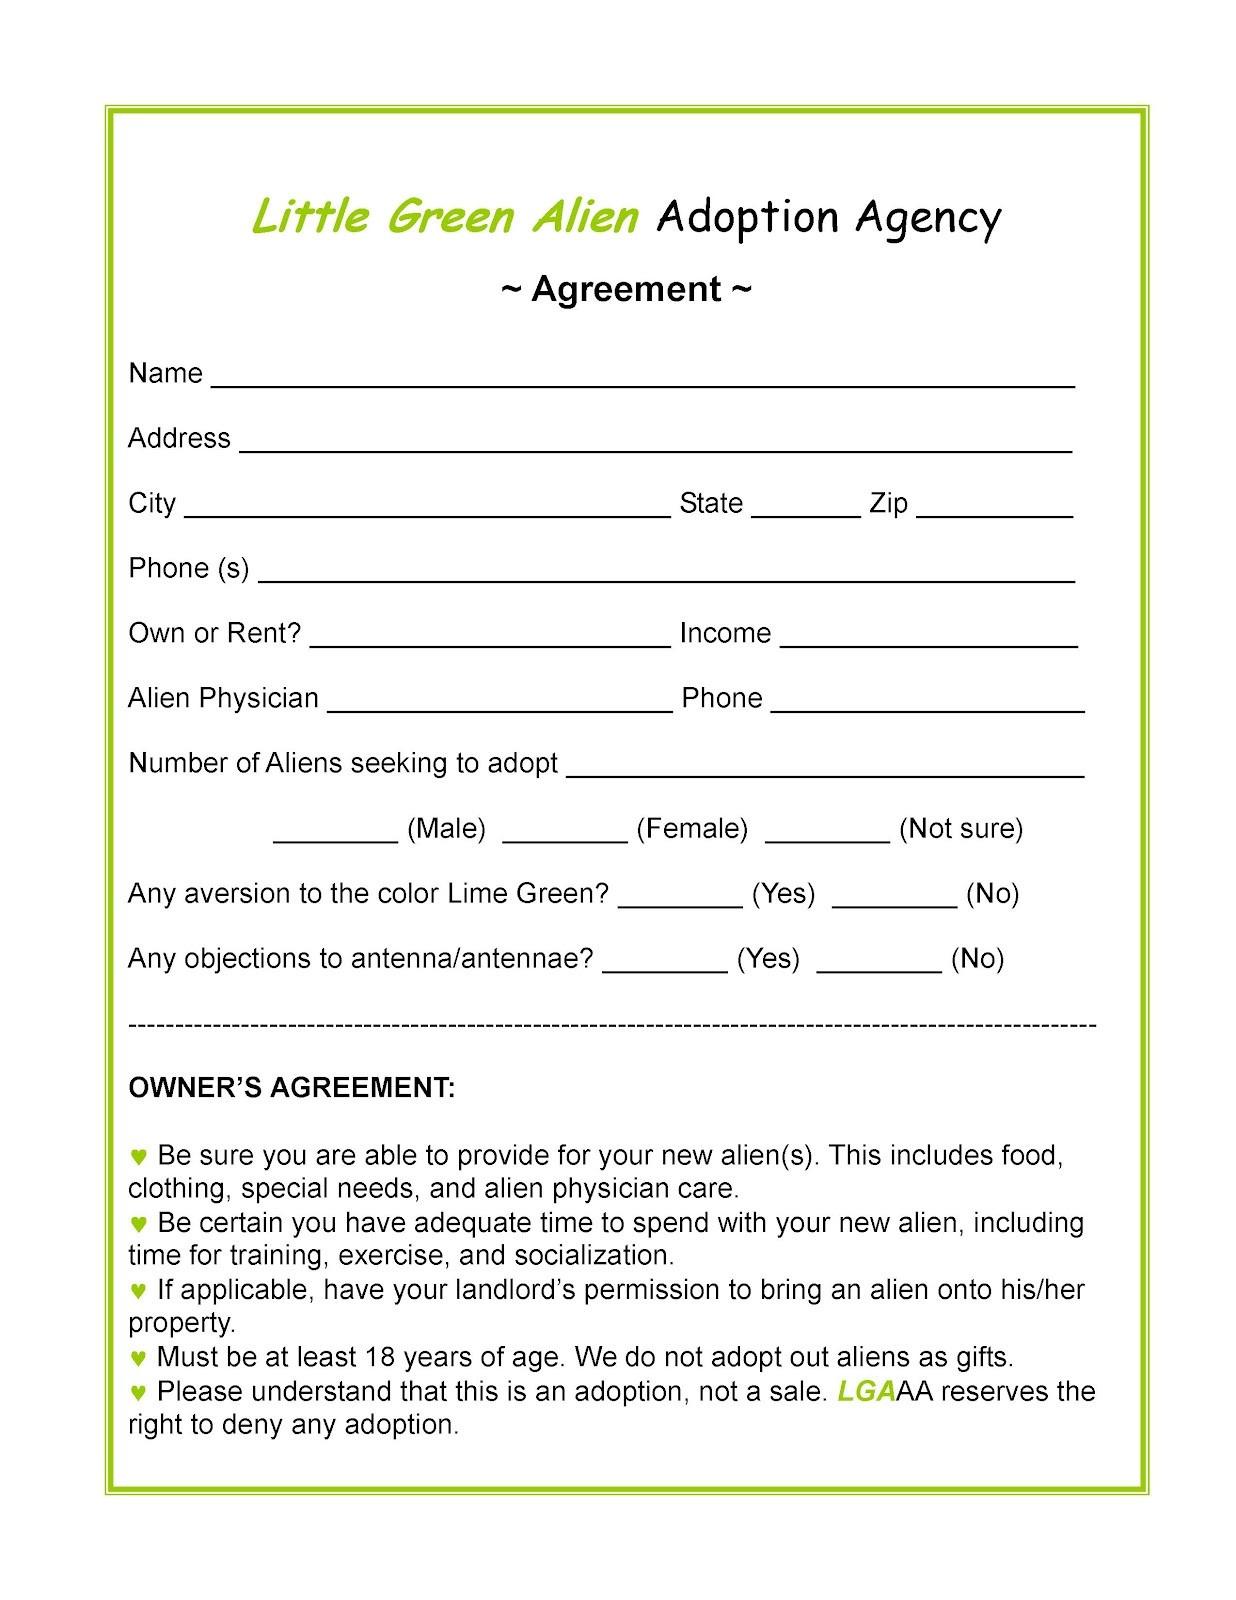 Fake Divorce Papers Beautiful Adoption Certificate Template Adoption - Fake Adoption Certificate Free Printable